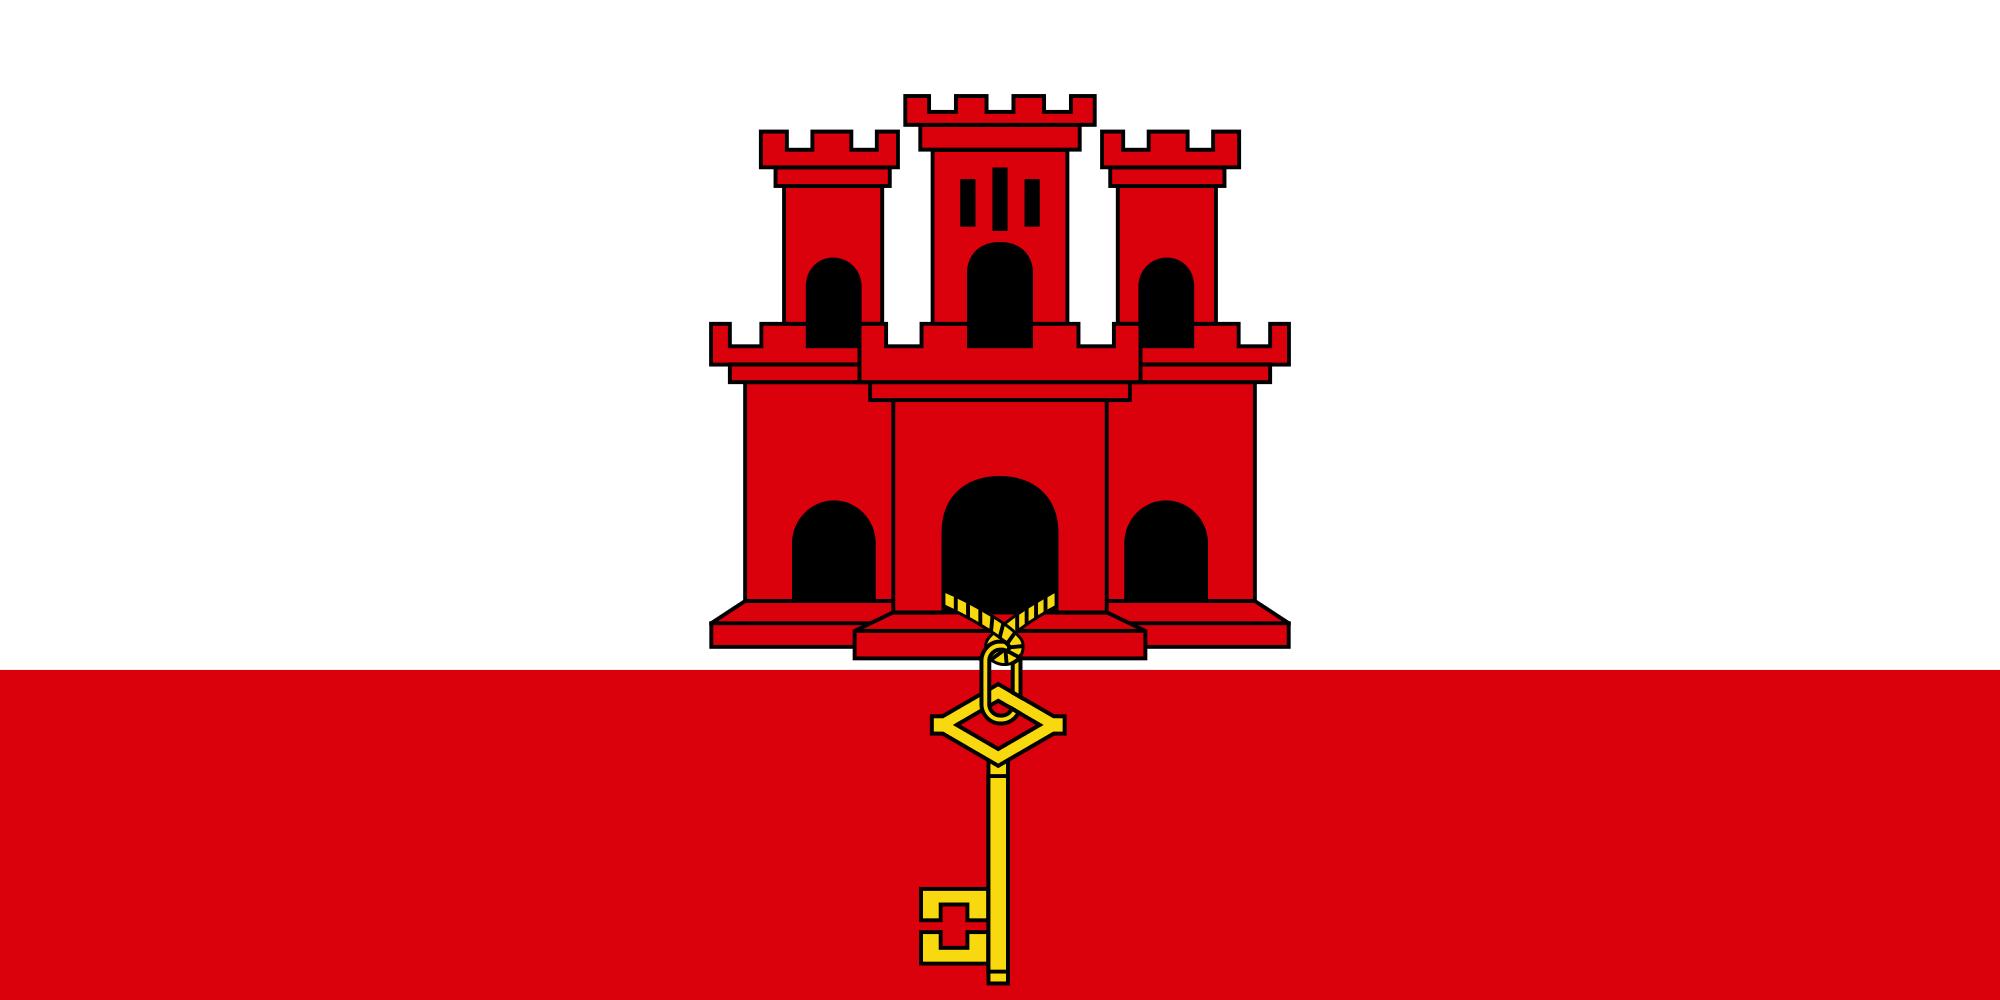 gibraltar, pays, emblème, logo, symbole - Fonds d'écran HD - Professor-falken.com